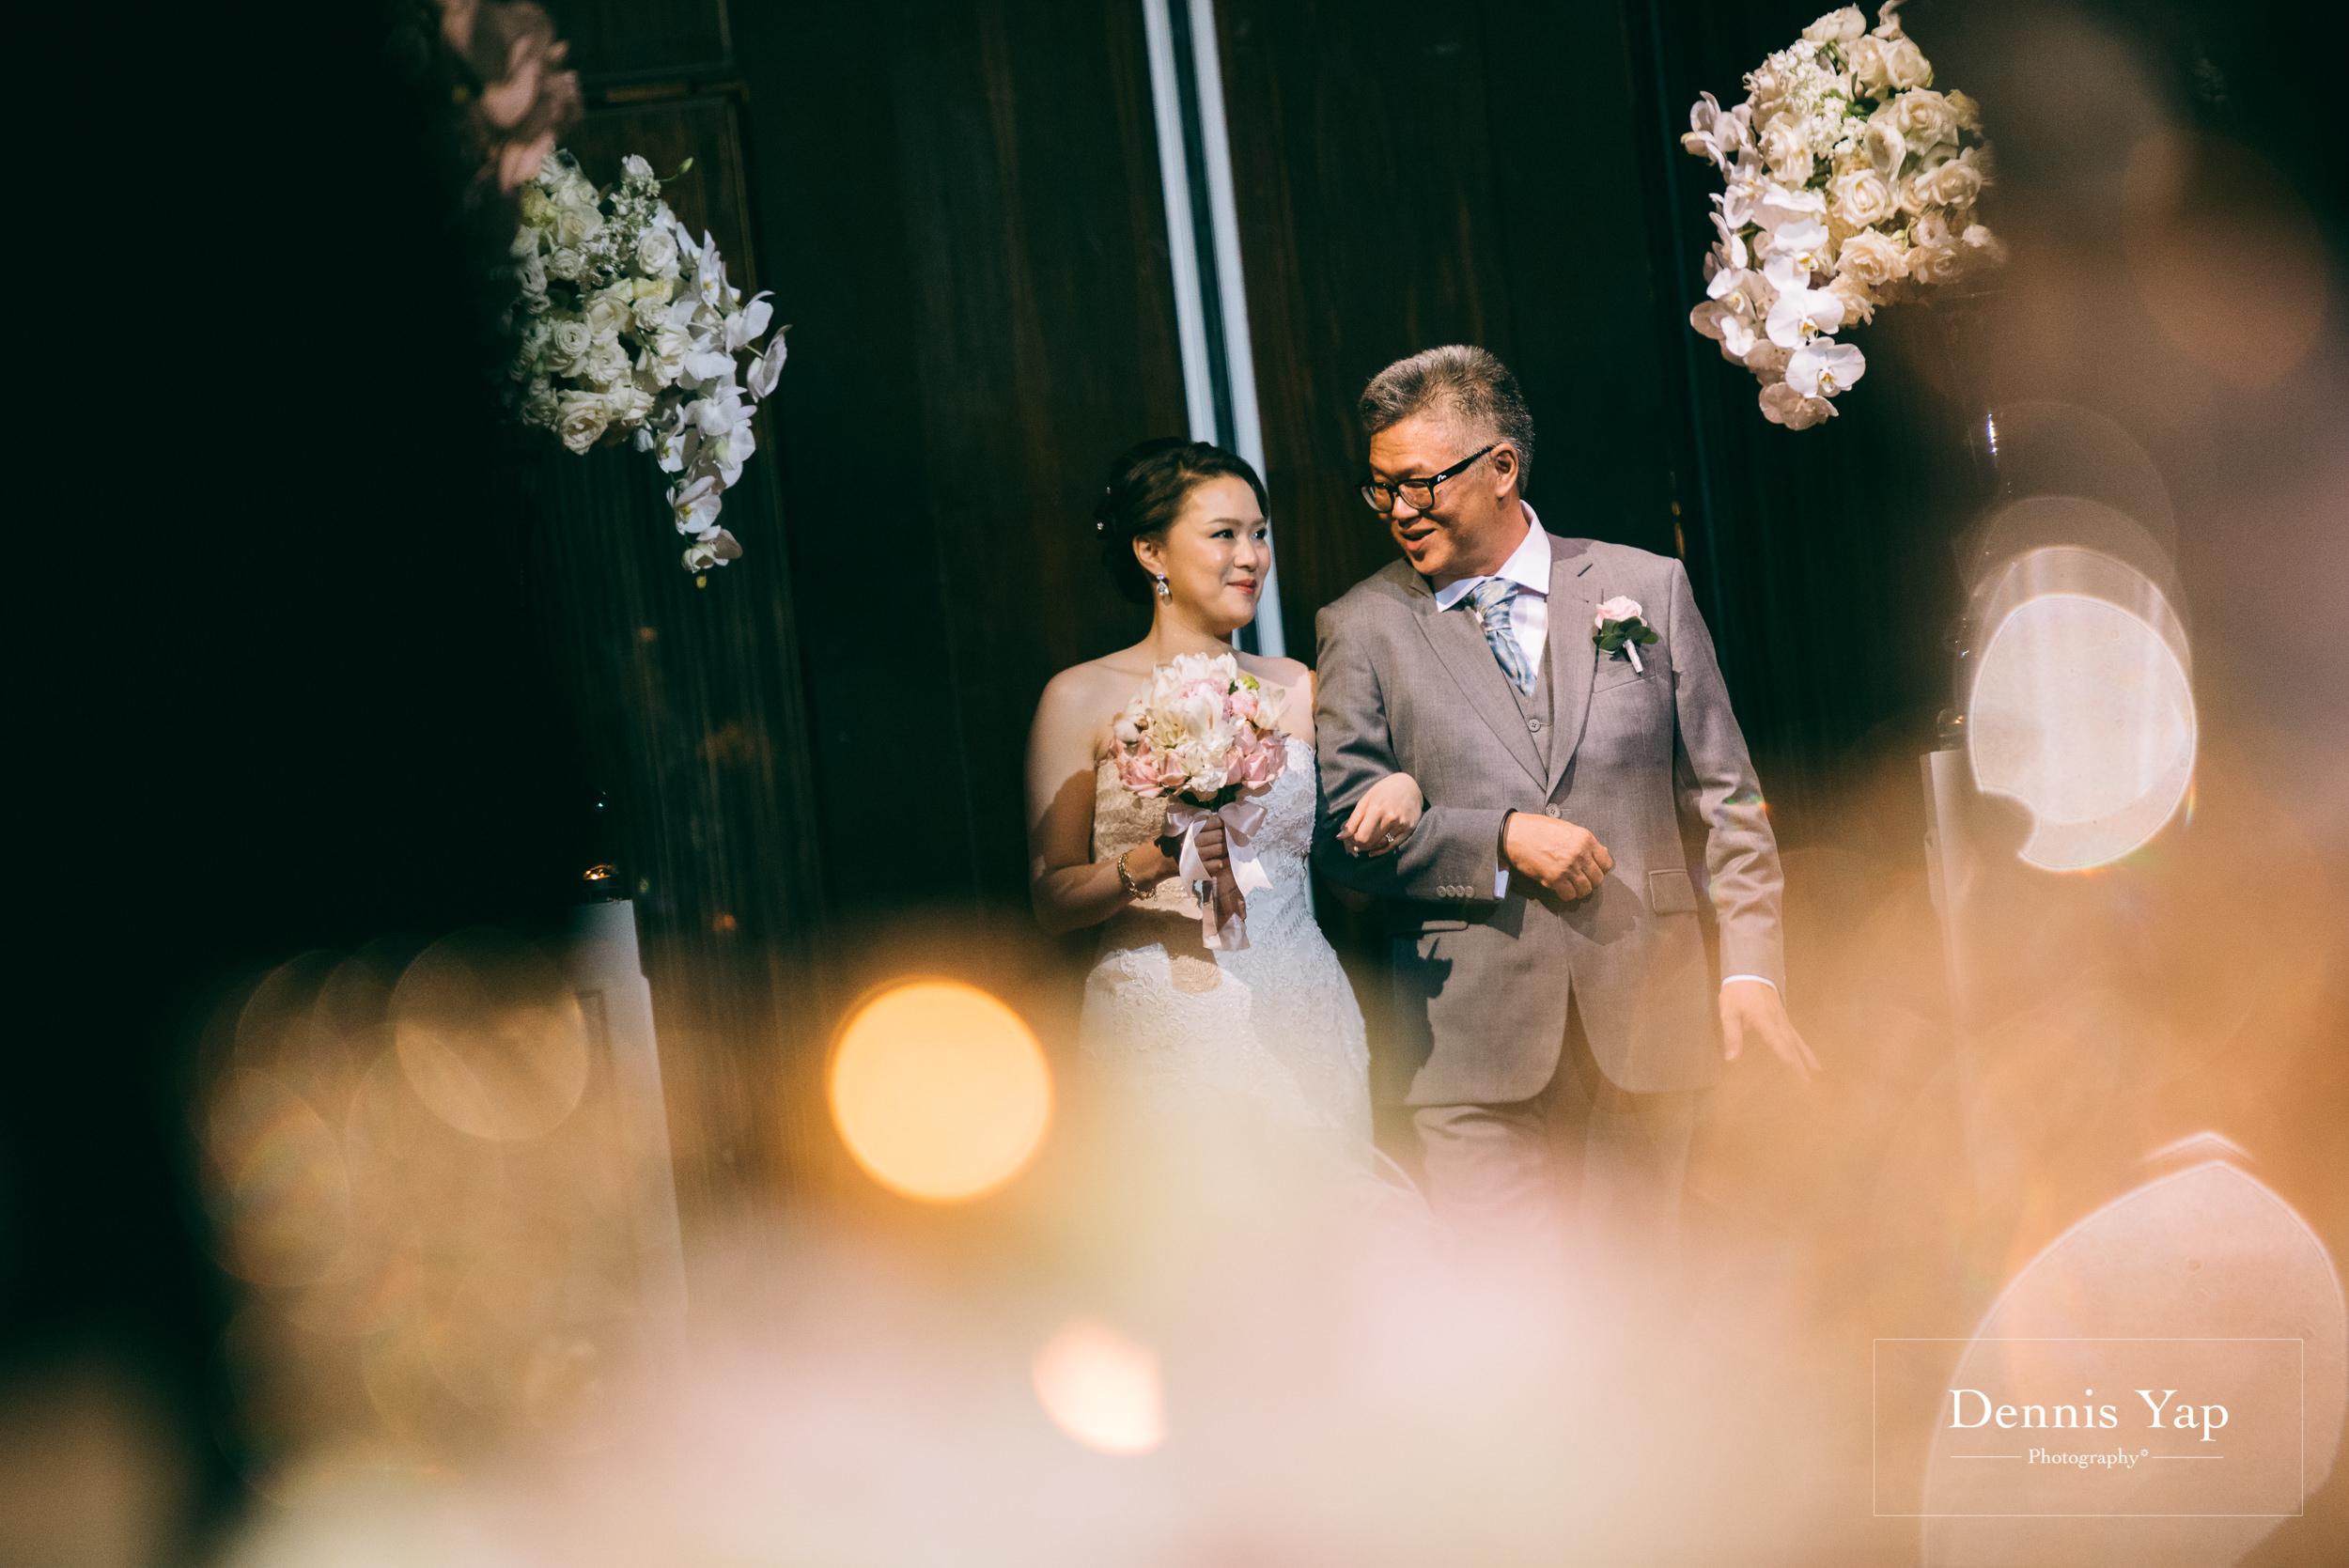 jordan amanda wedding day westin hotel kuala lumpur choe family dennis yap photography-24.jpg